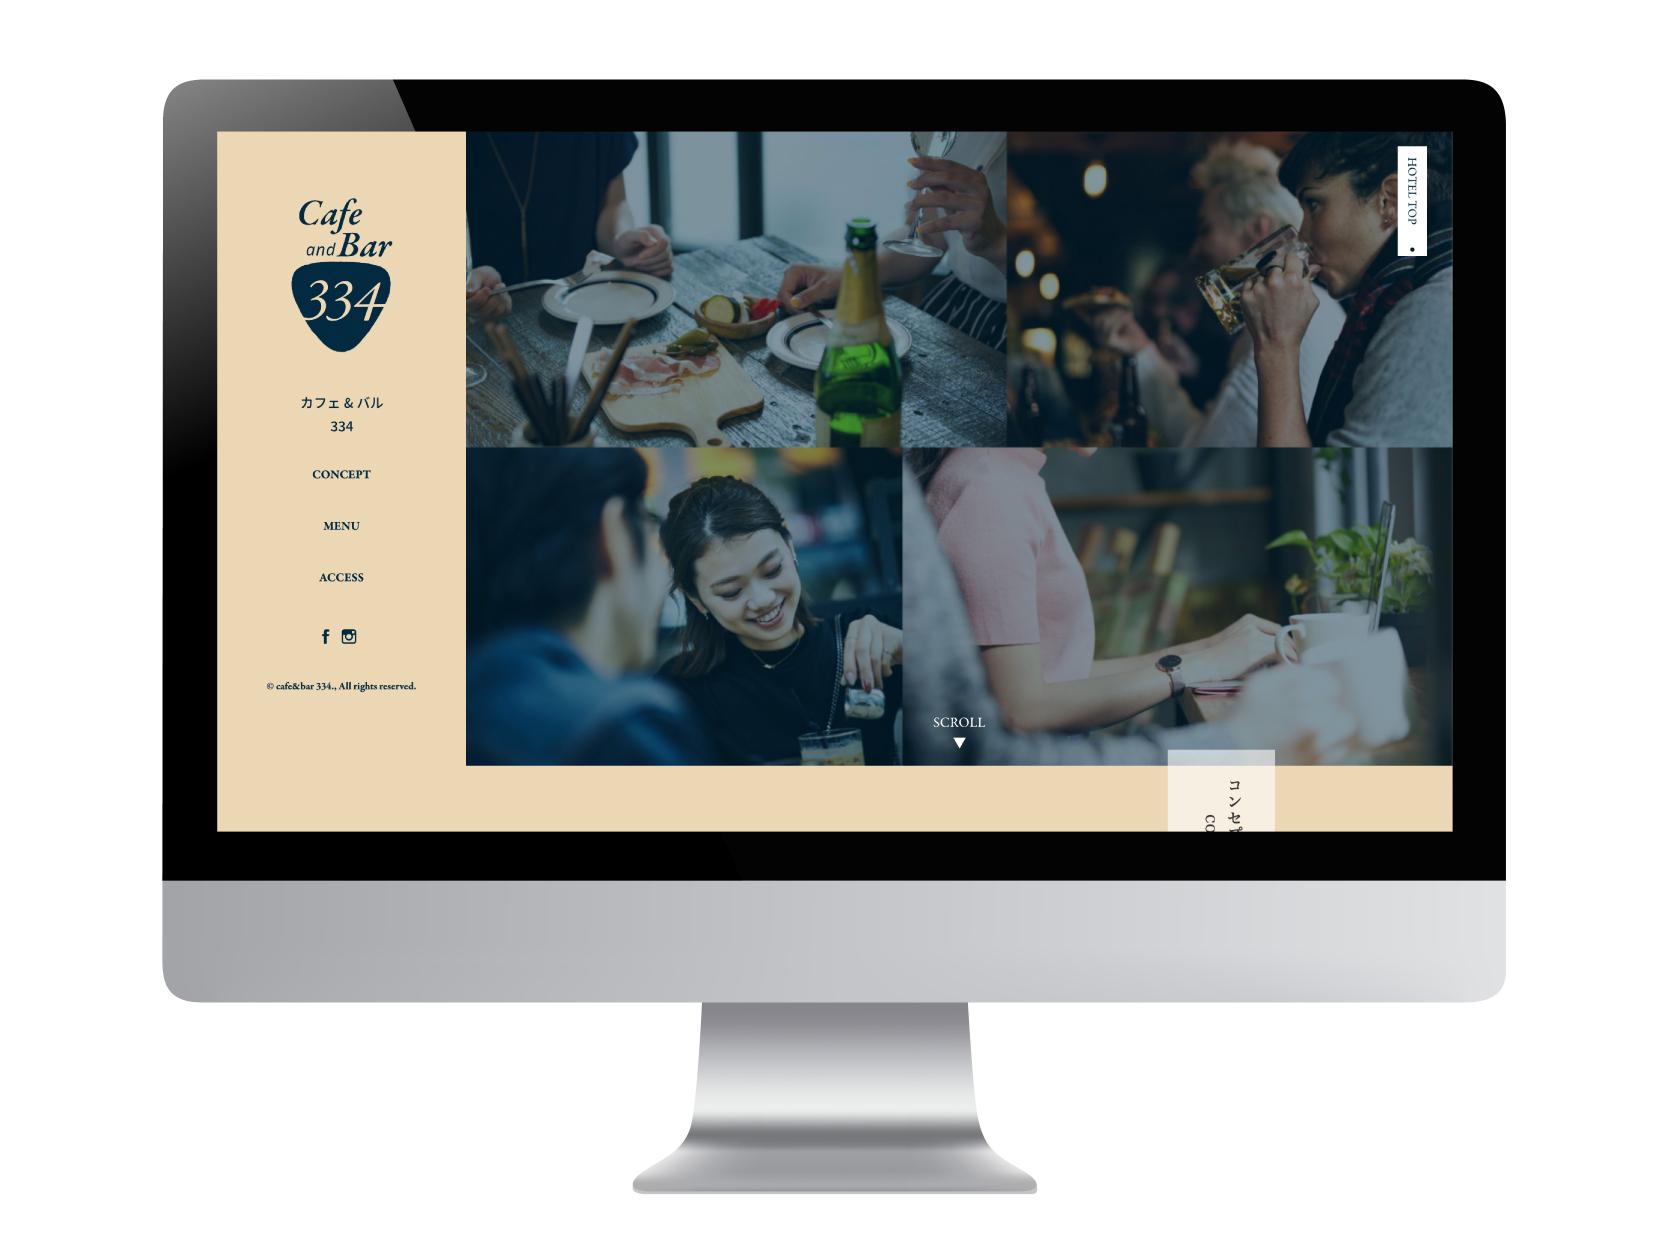 <span>Official web site</span><br>知床北こぶしグループ<br>カフェ&バル 334